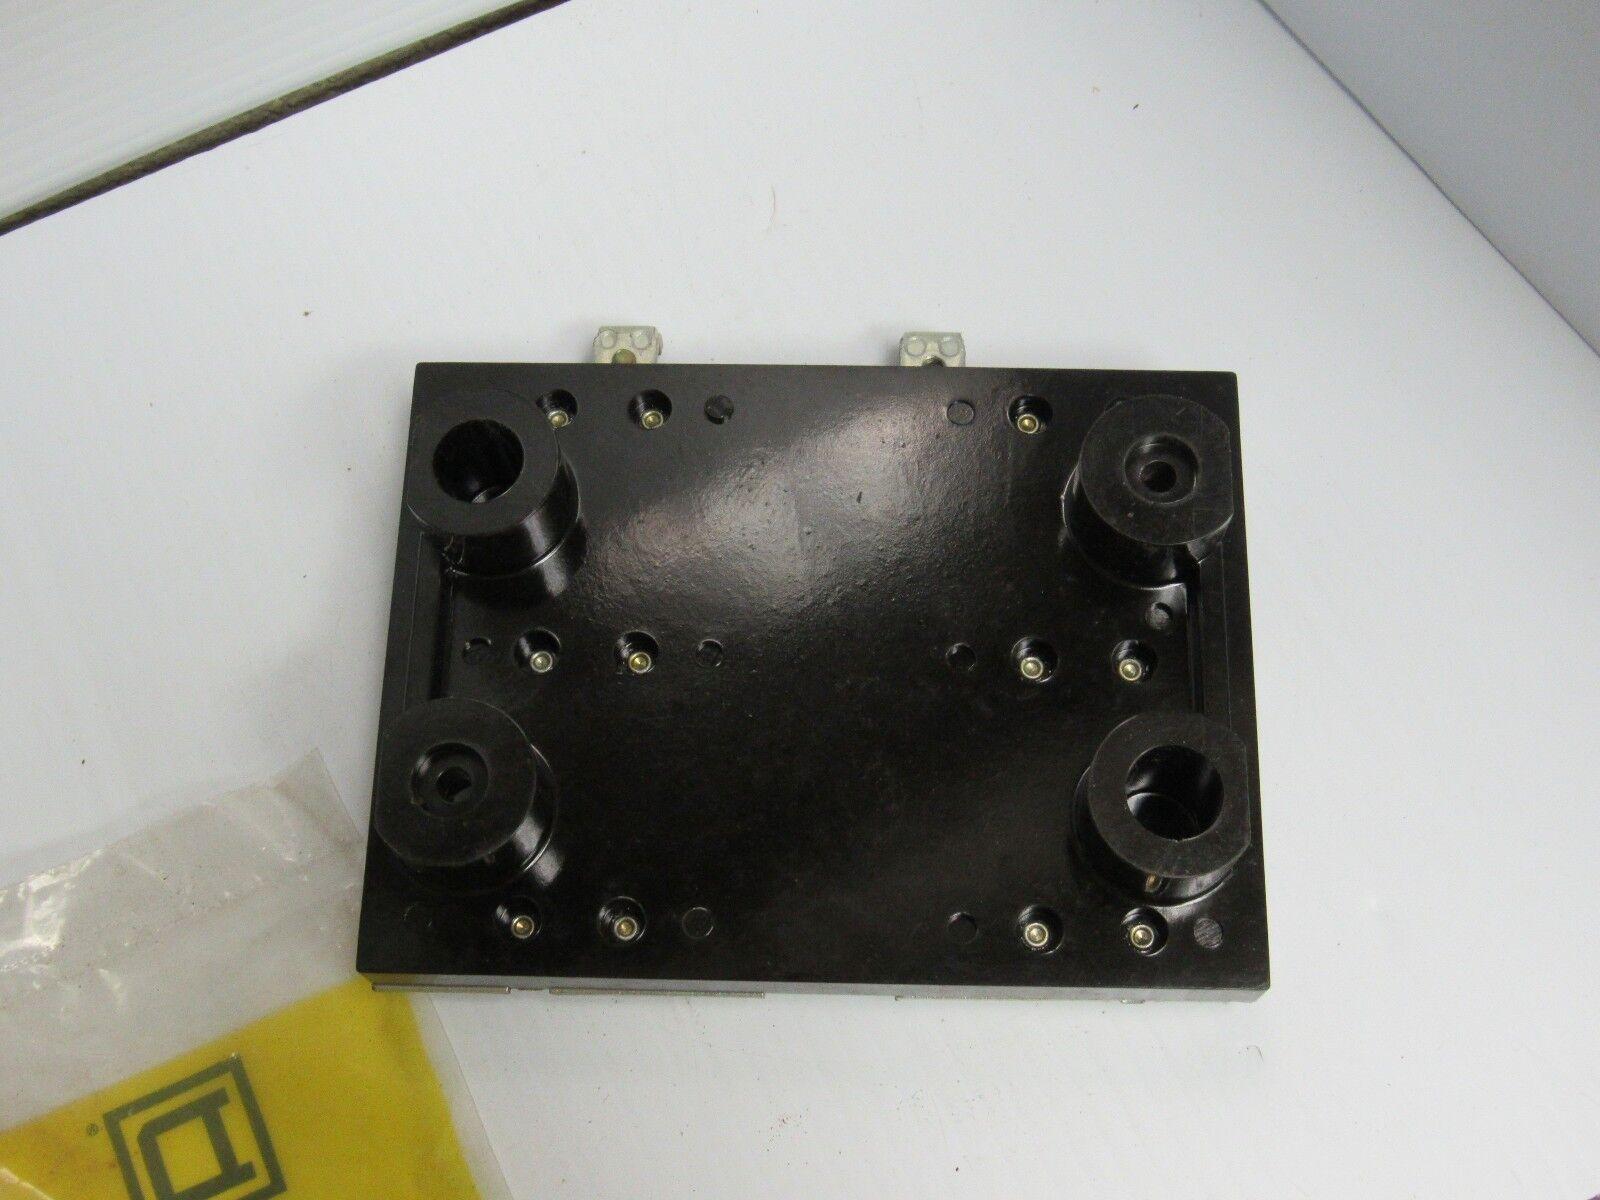 New Square D Fuse Block Kit 9999 Sf1 9999sf1 Wundr Shop 10pc Pic Printed Circuit Board 0 5a 15a 125v Ebay